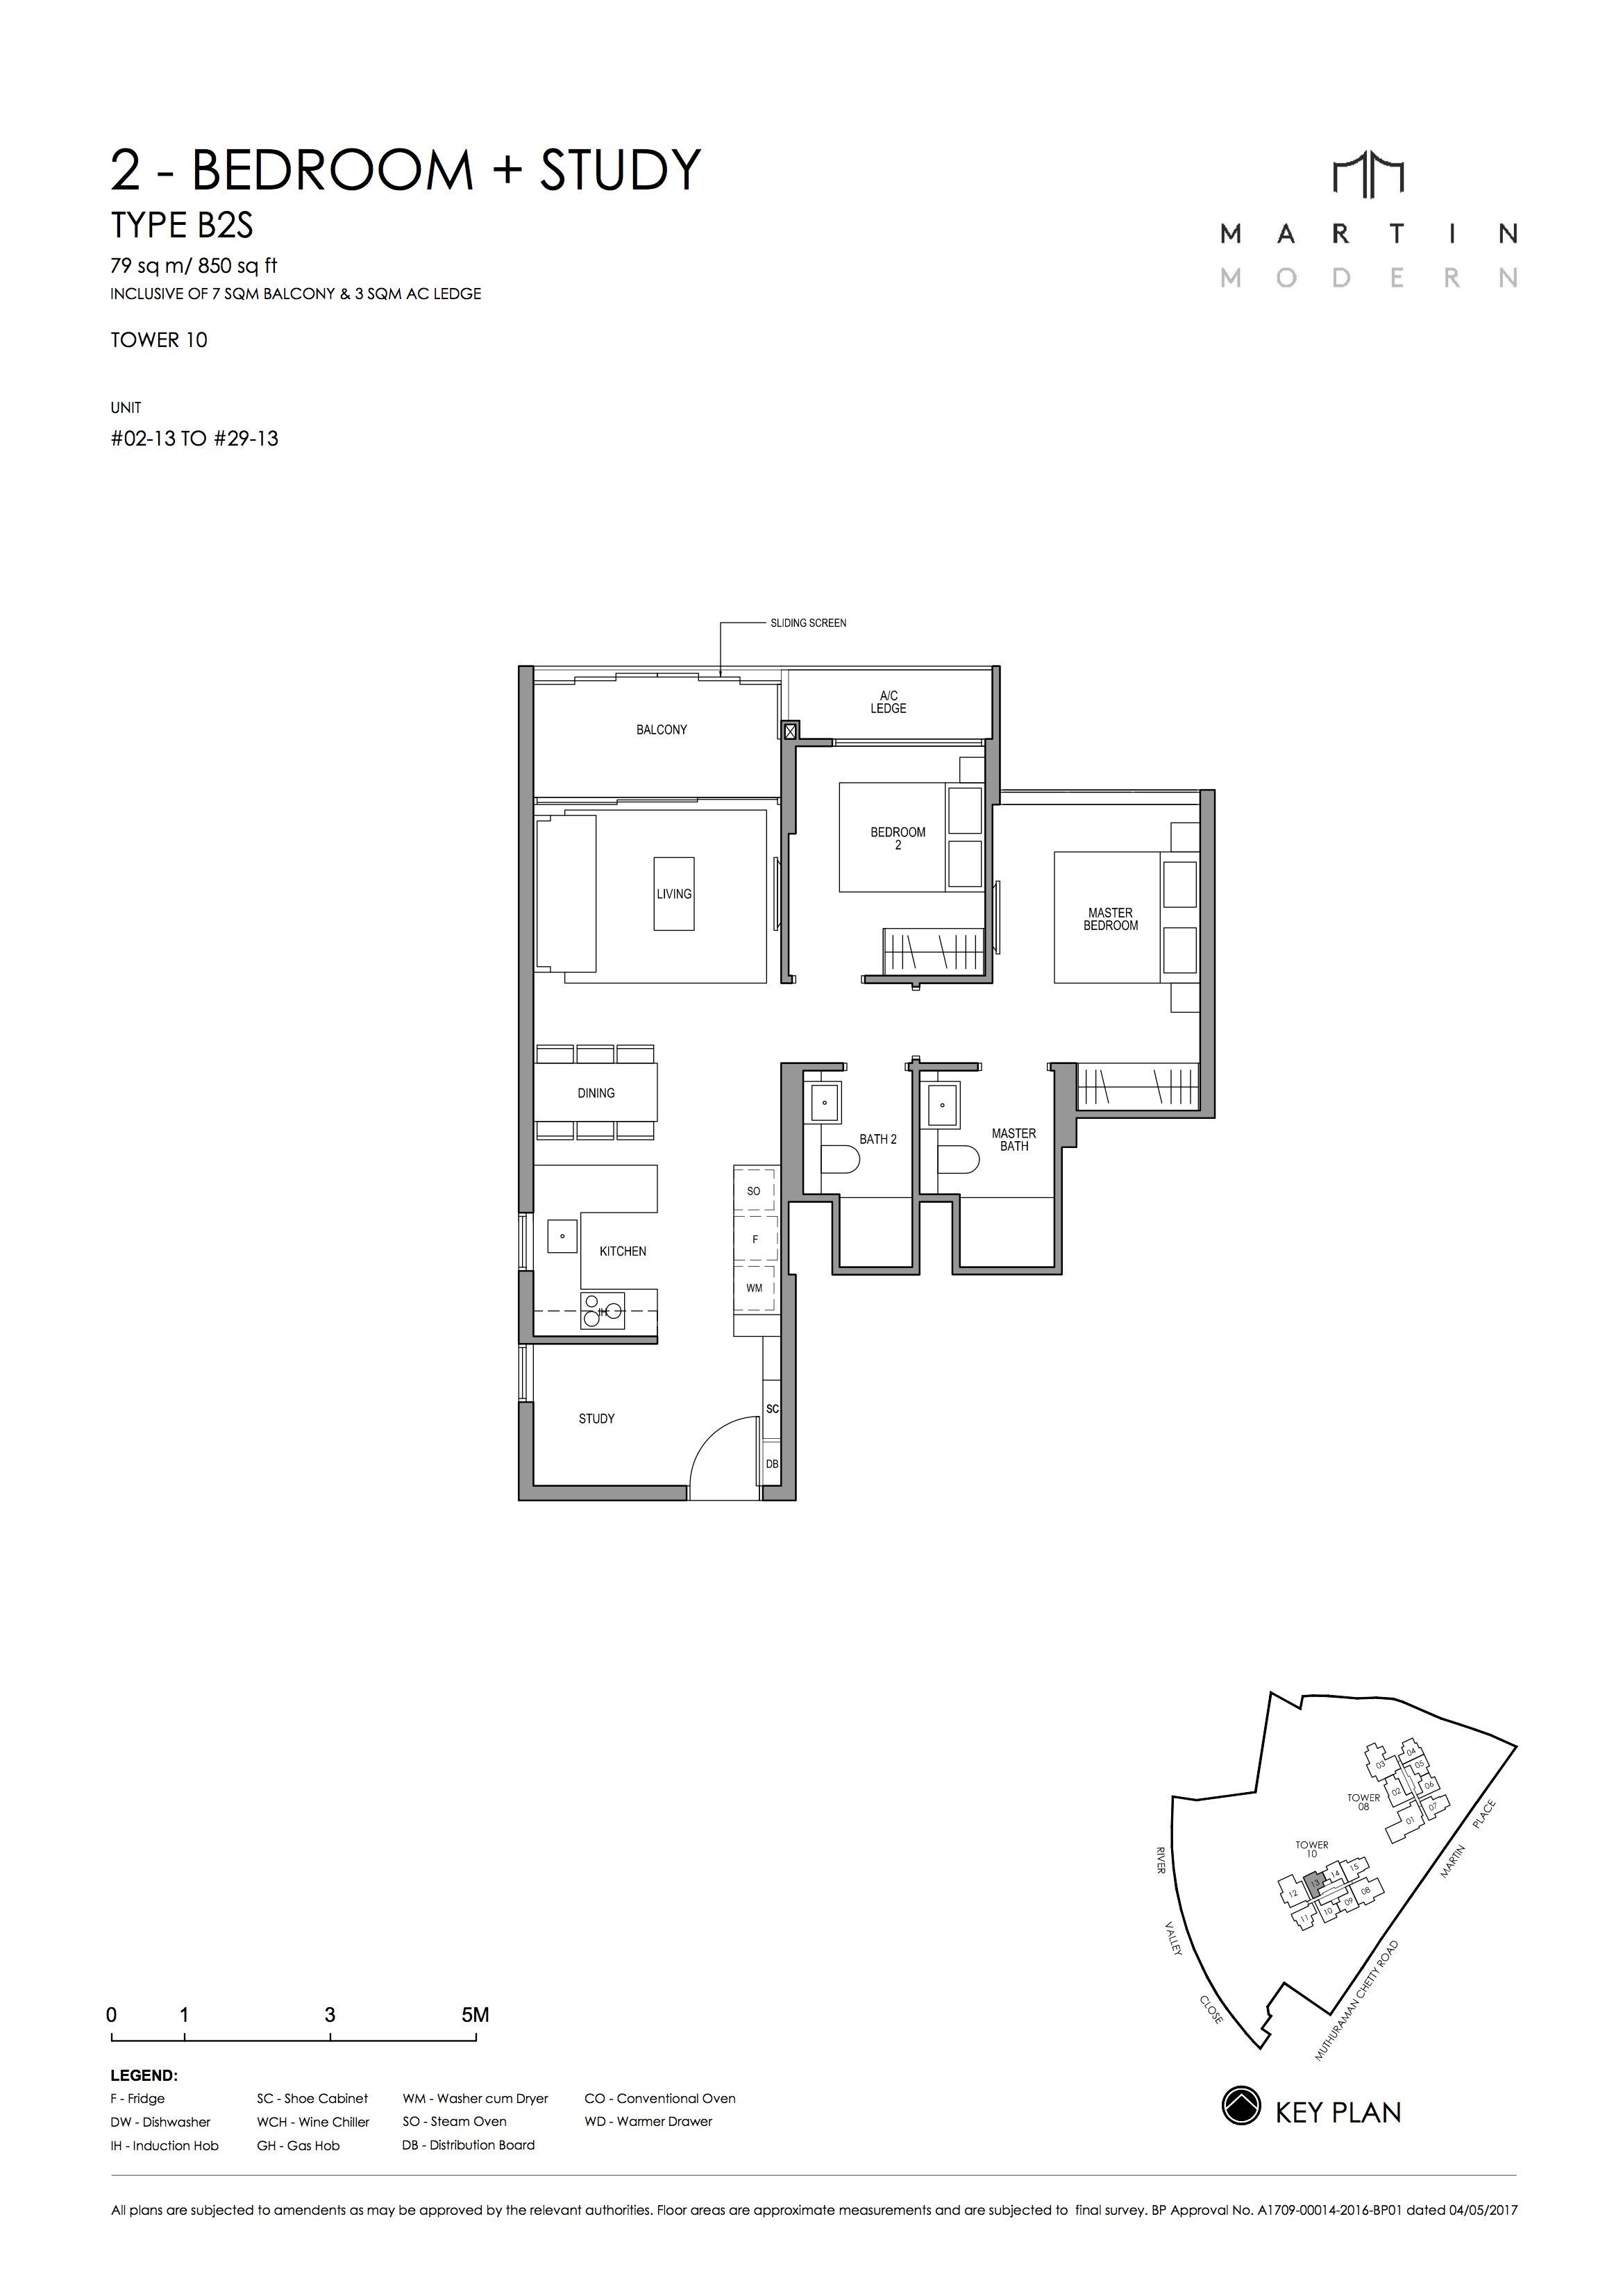 MARTIN MODERN 2-Bedroom TYPE B2S